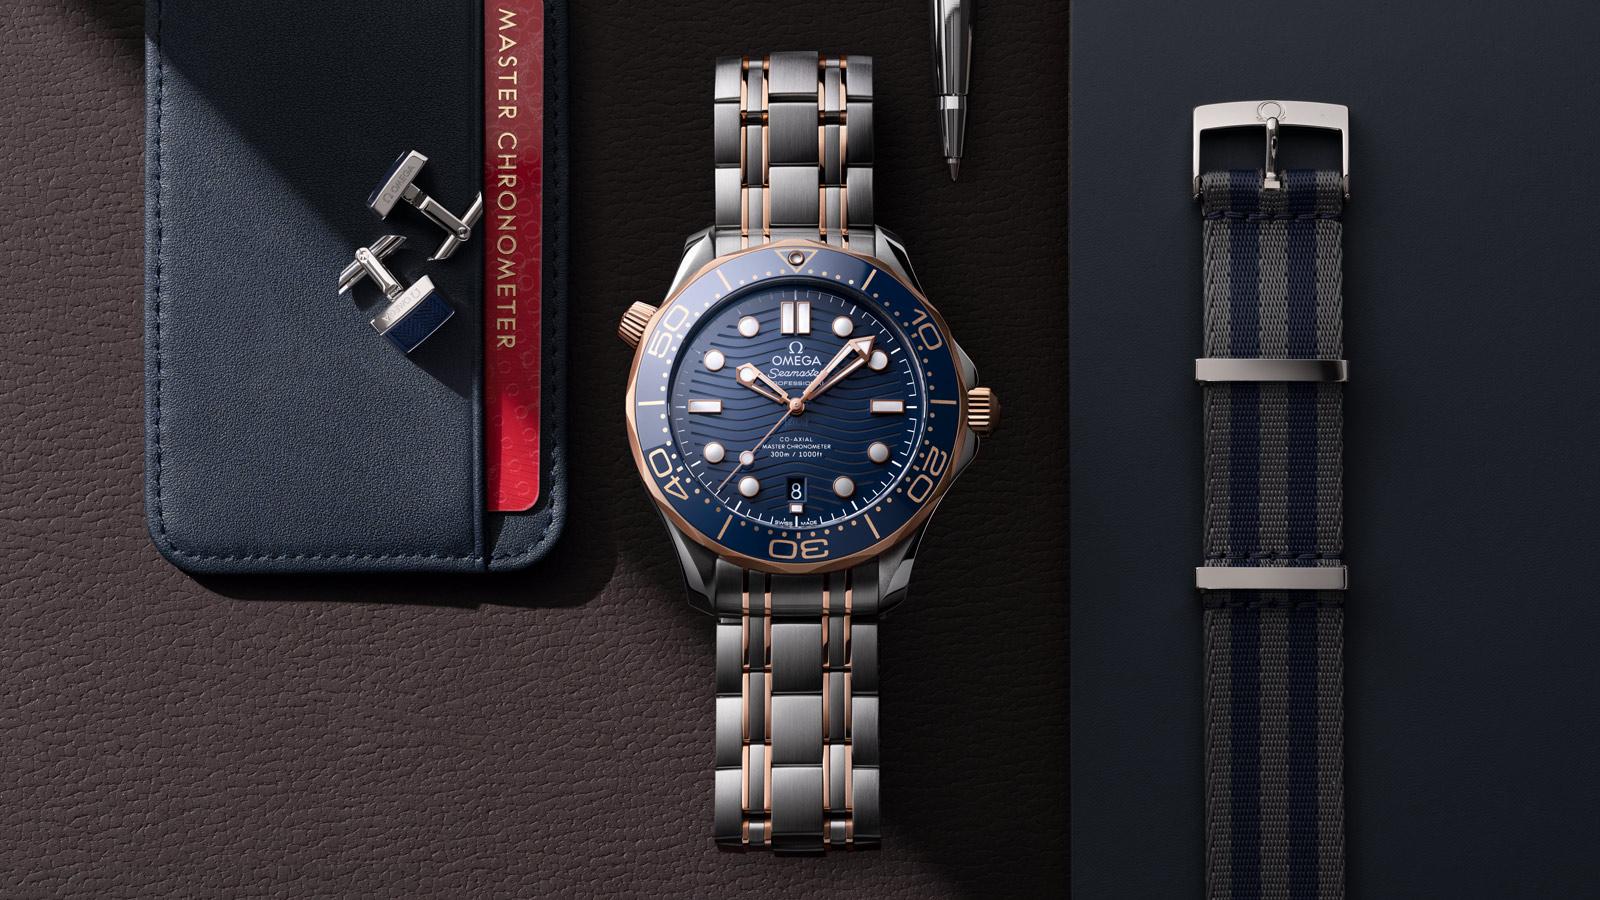 Seamaster 300米潜水表 300米潜水表 欧米茄同轴•至臻天文台表42毫米 腕表 - 210.20.42.20.03.002